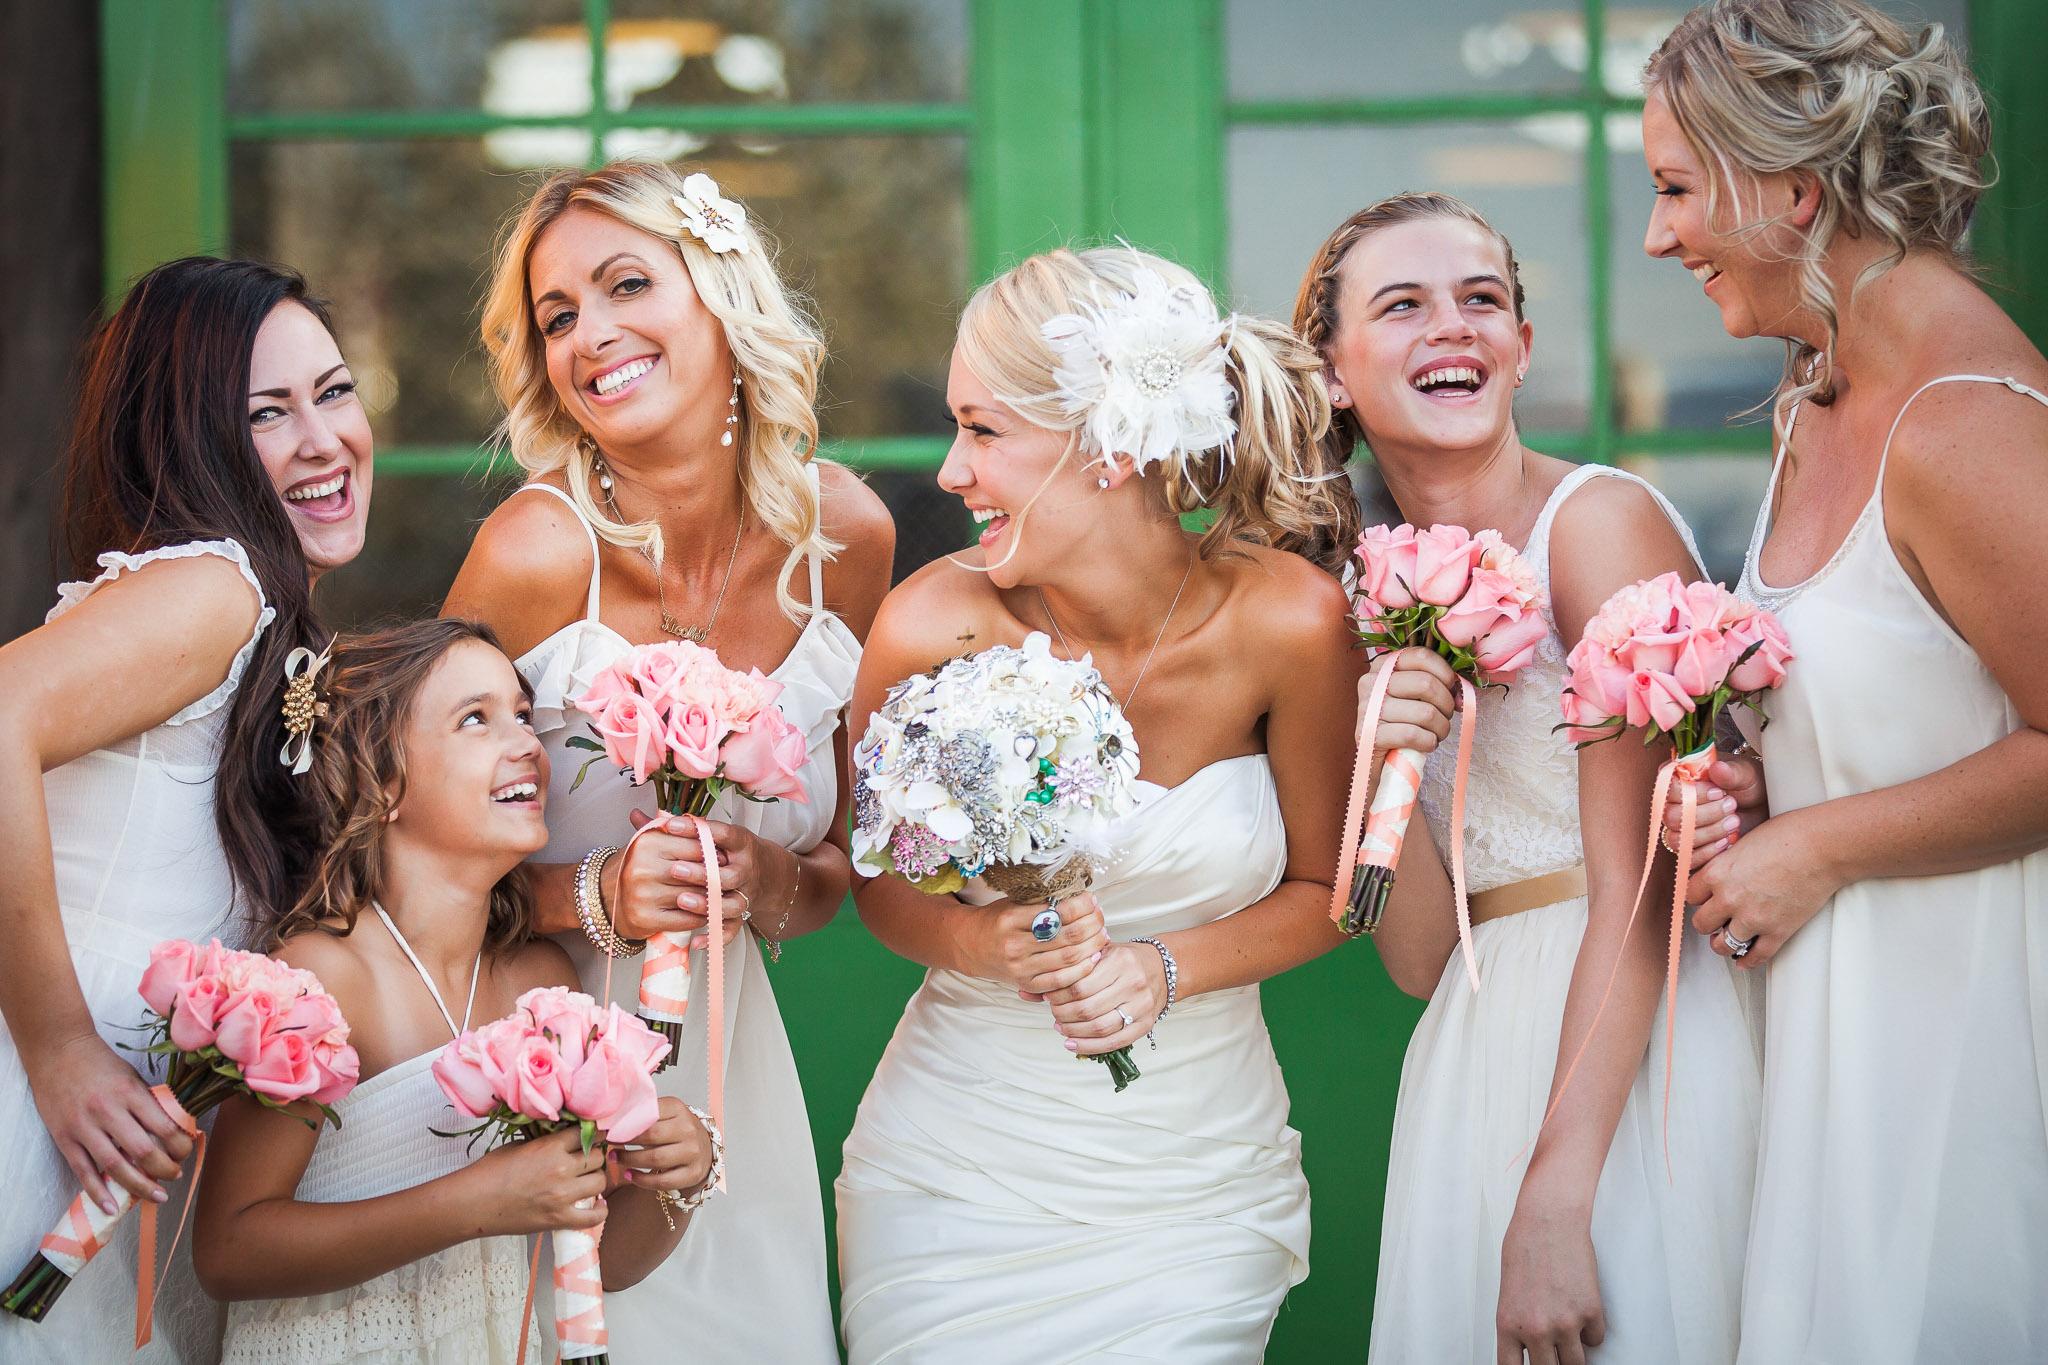 Orange County Wedding Photographer Motte Historical Museum Barn Venue Rustic Country Bridesmaids 07